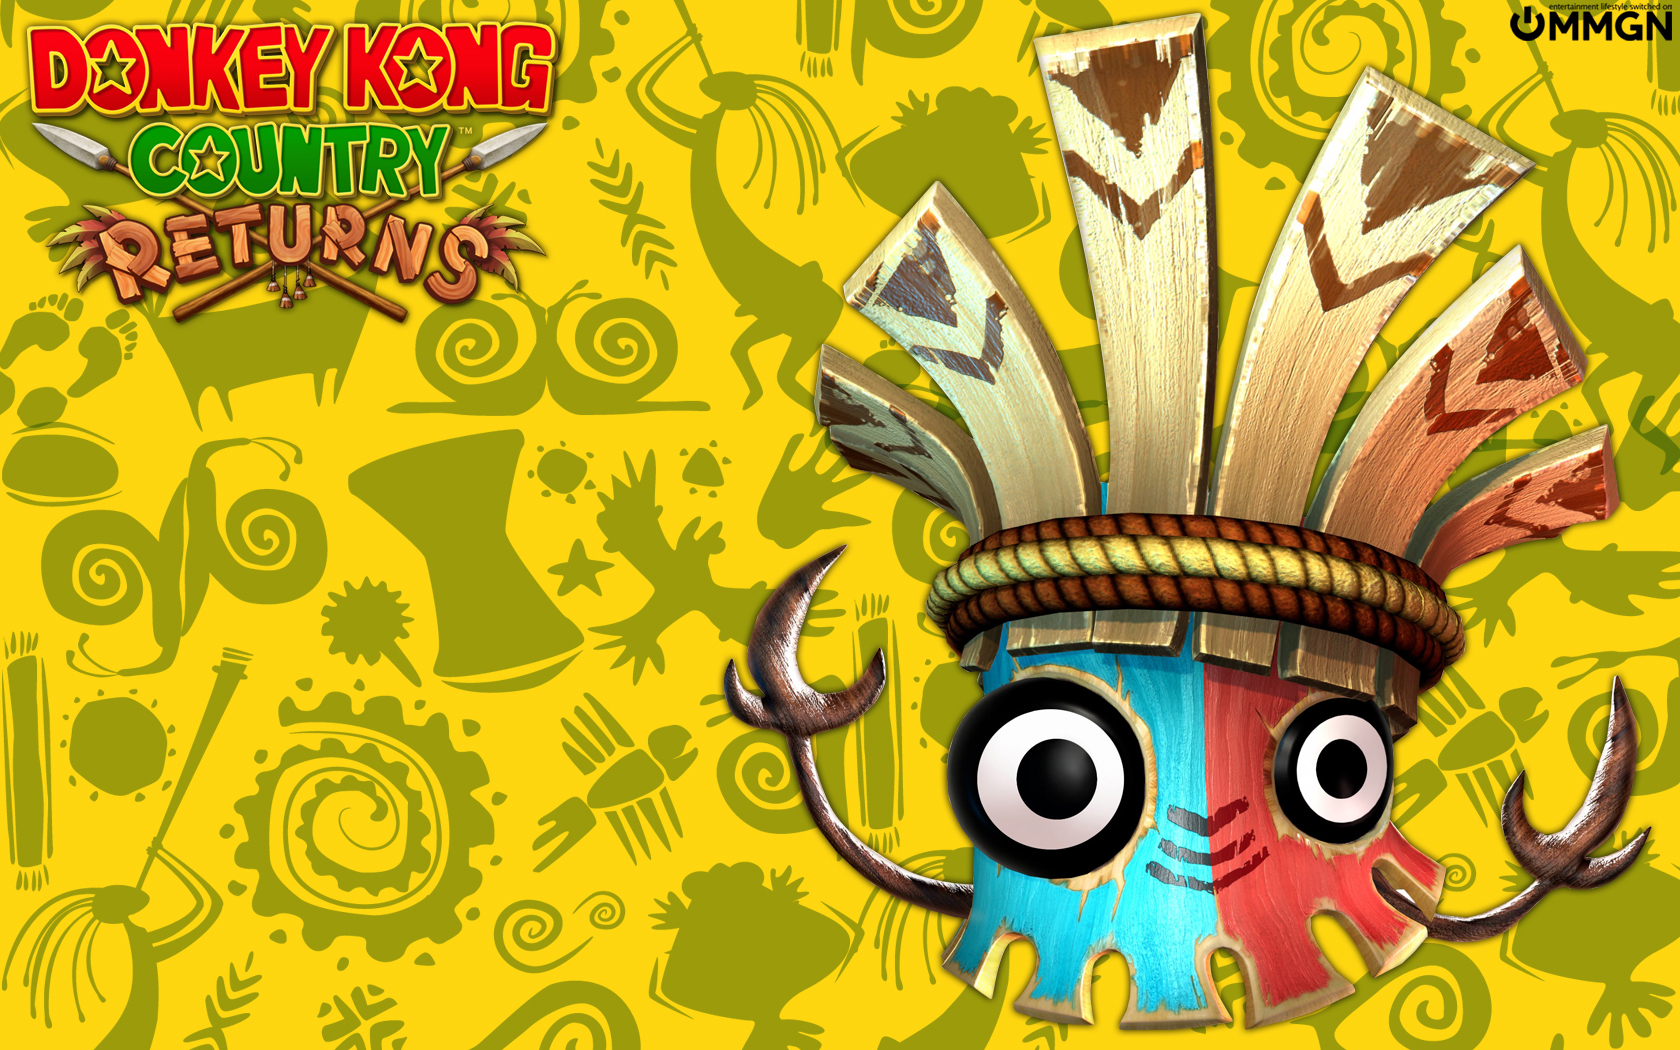 Donkey Kong Country Returns Donkey Kong Wallpaper 25771532